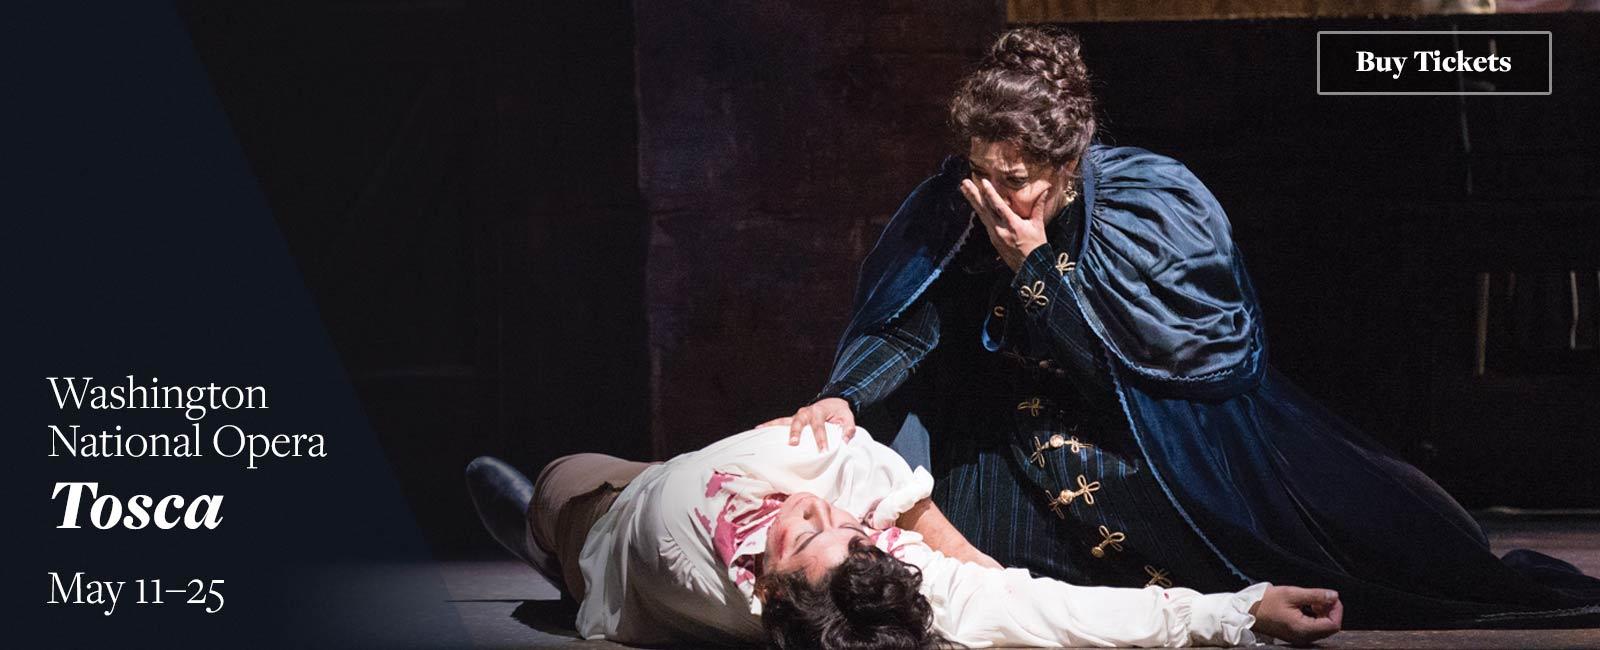 Washington National Opera: Tosca